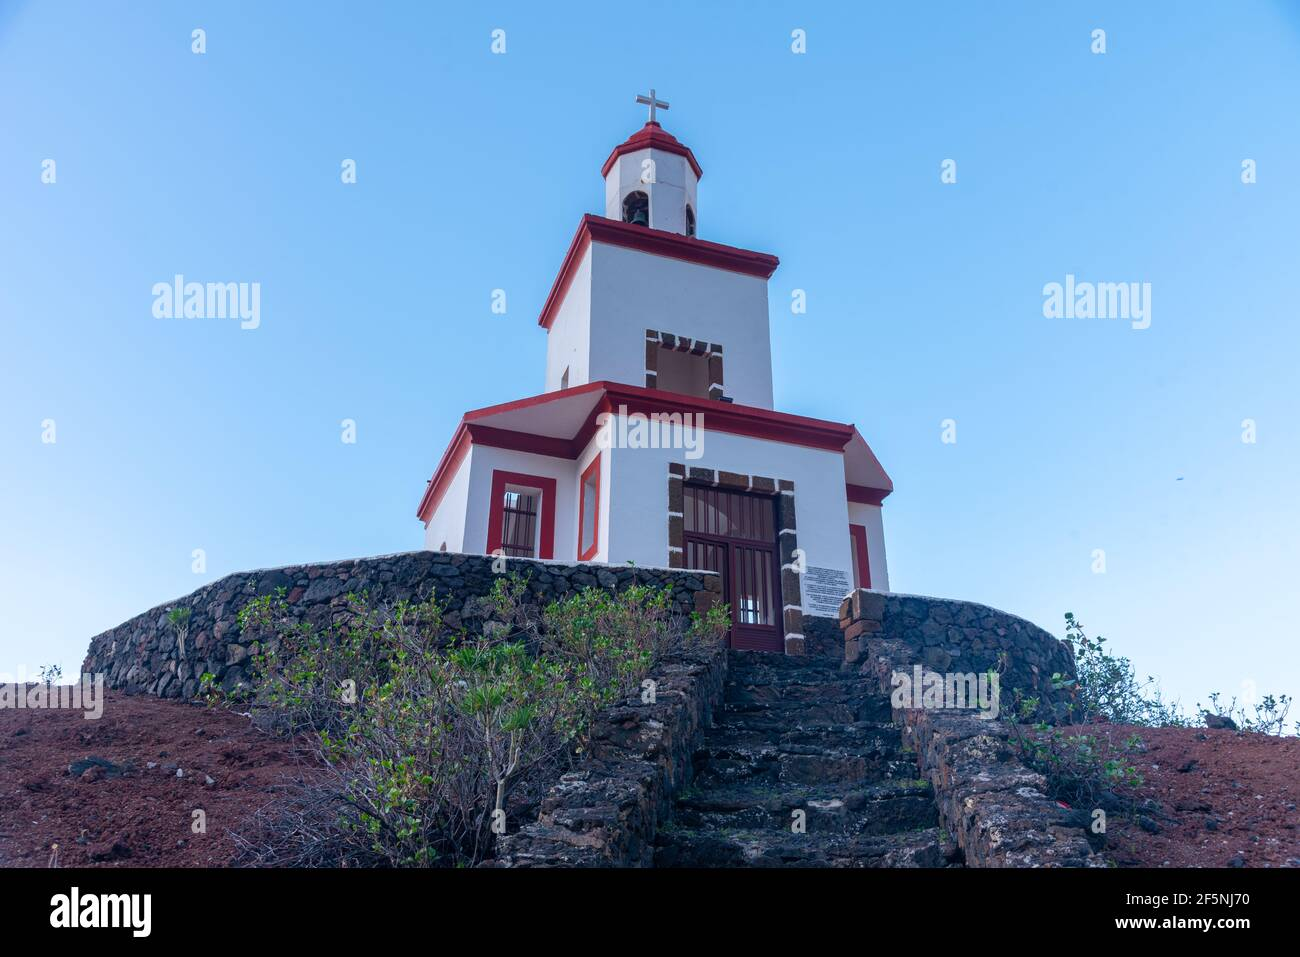 Bell tower above the Parish church of Nuestra Senora de Candelaria at La frontera at El Hierro, Canary islands, Spain. Stock Photo